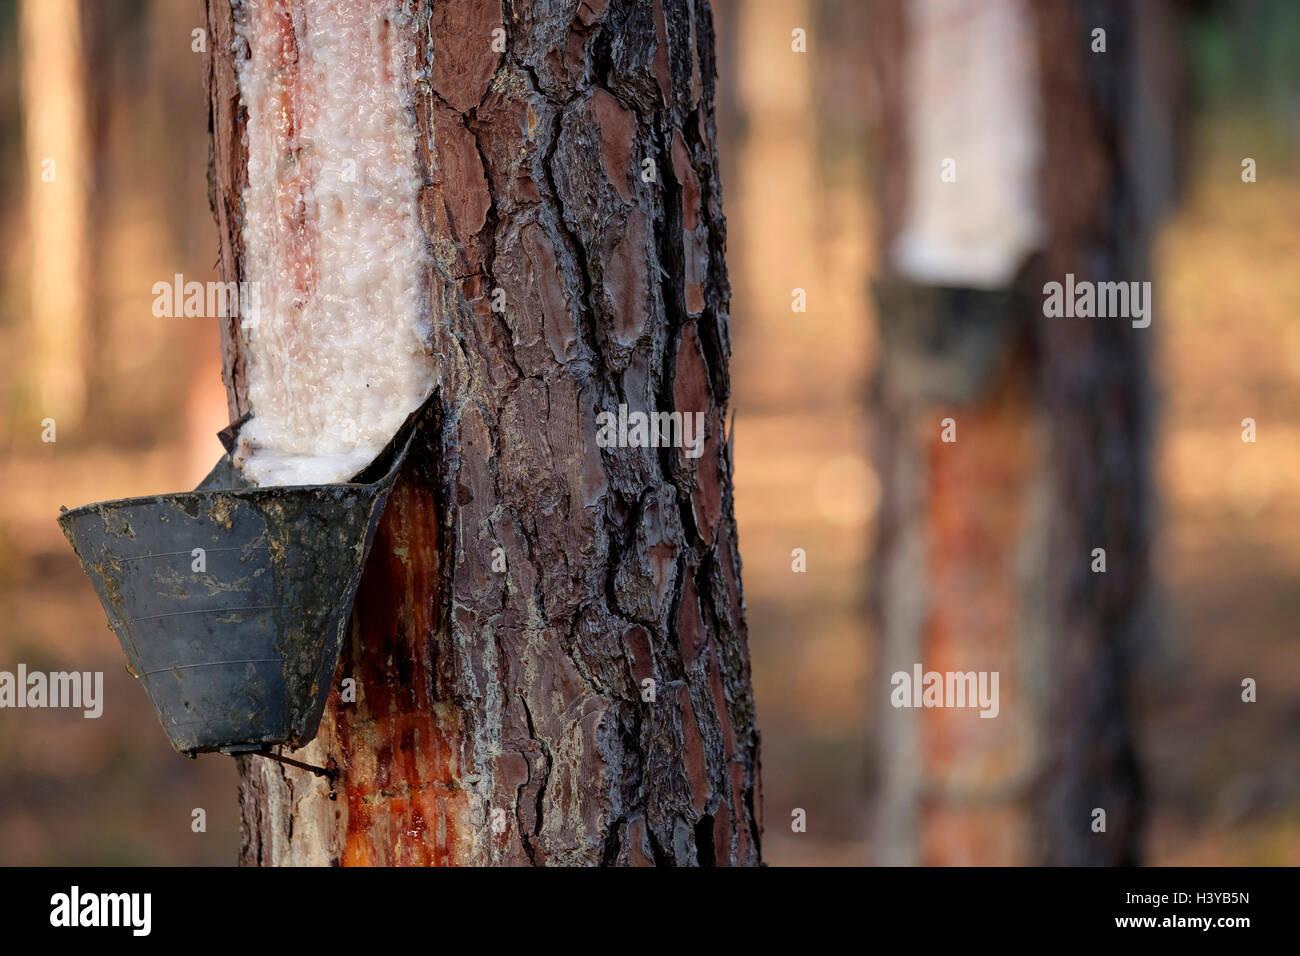 Resin extraction on pine tree Stock Photo